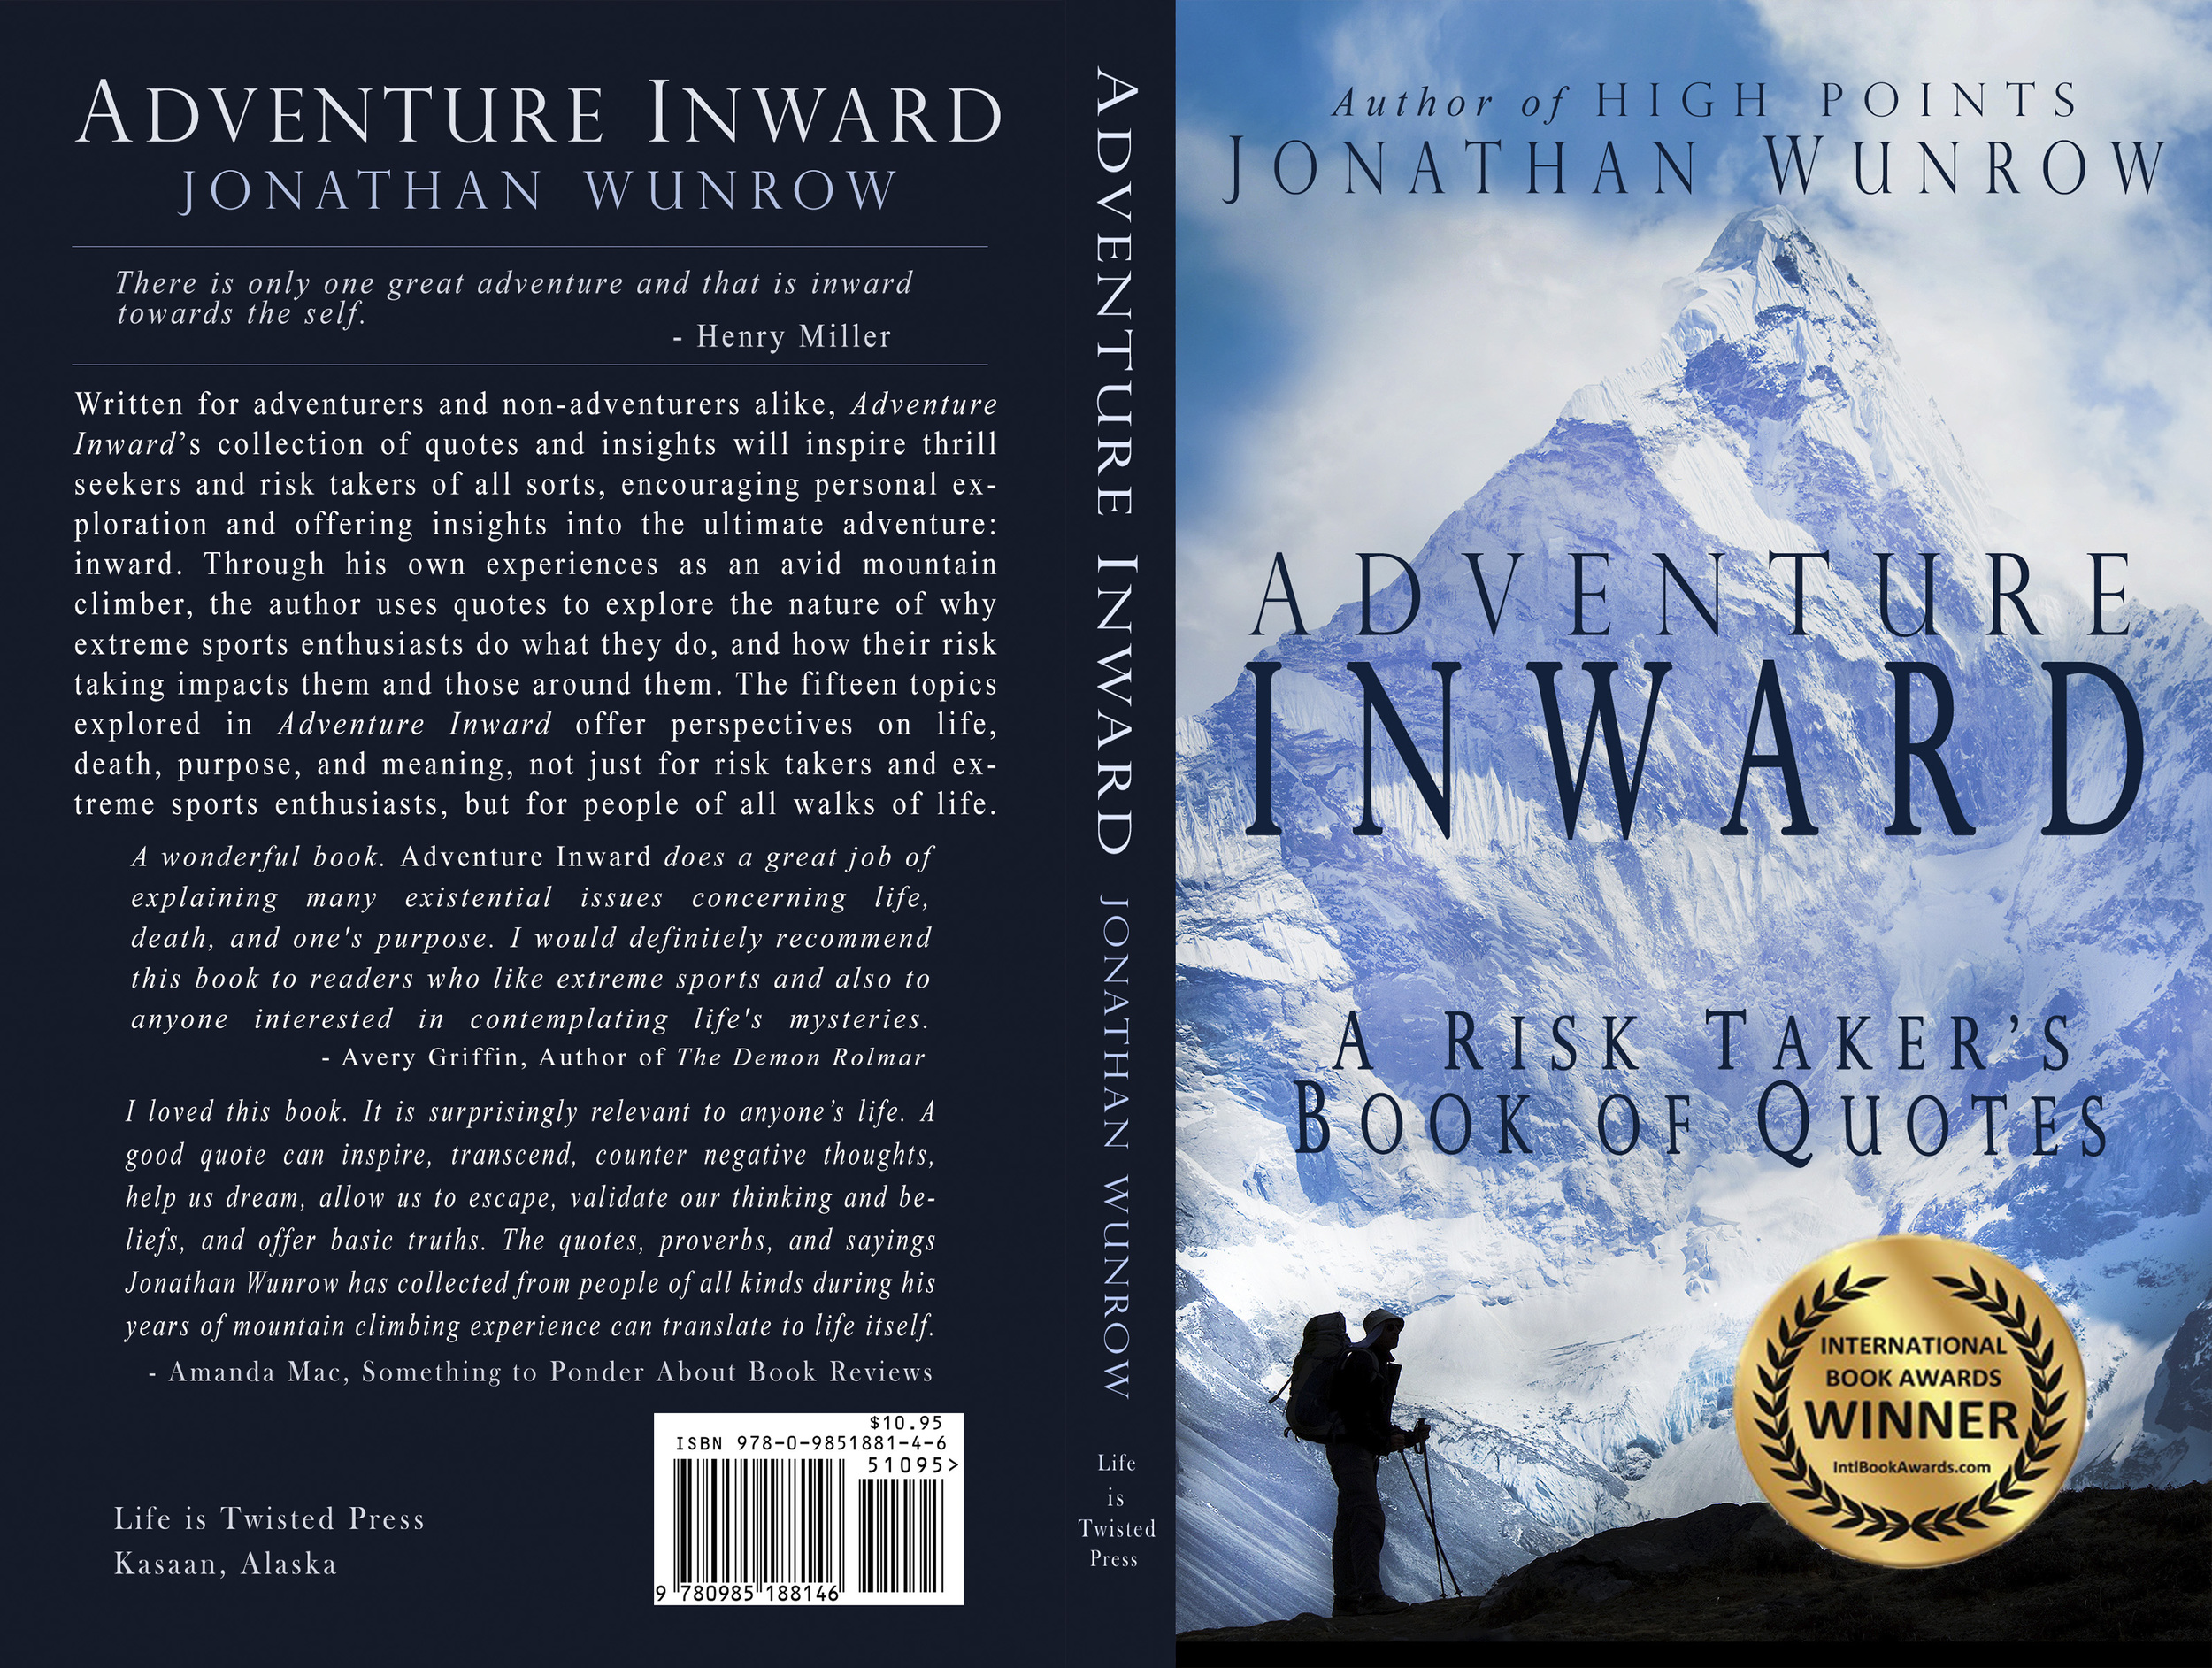 International Book Awards Winner 'Adventure Inward' by Jonathan Wunrow